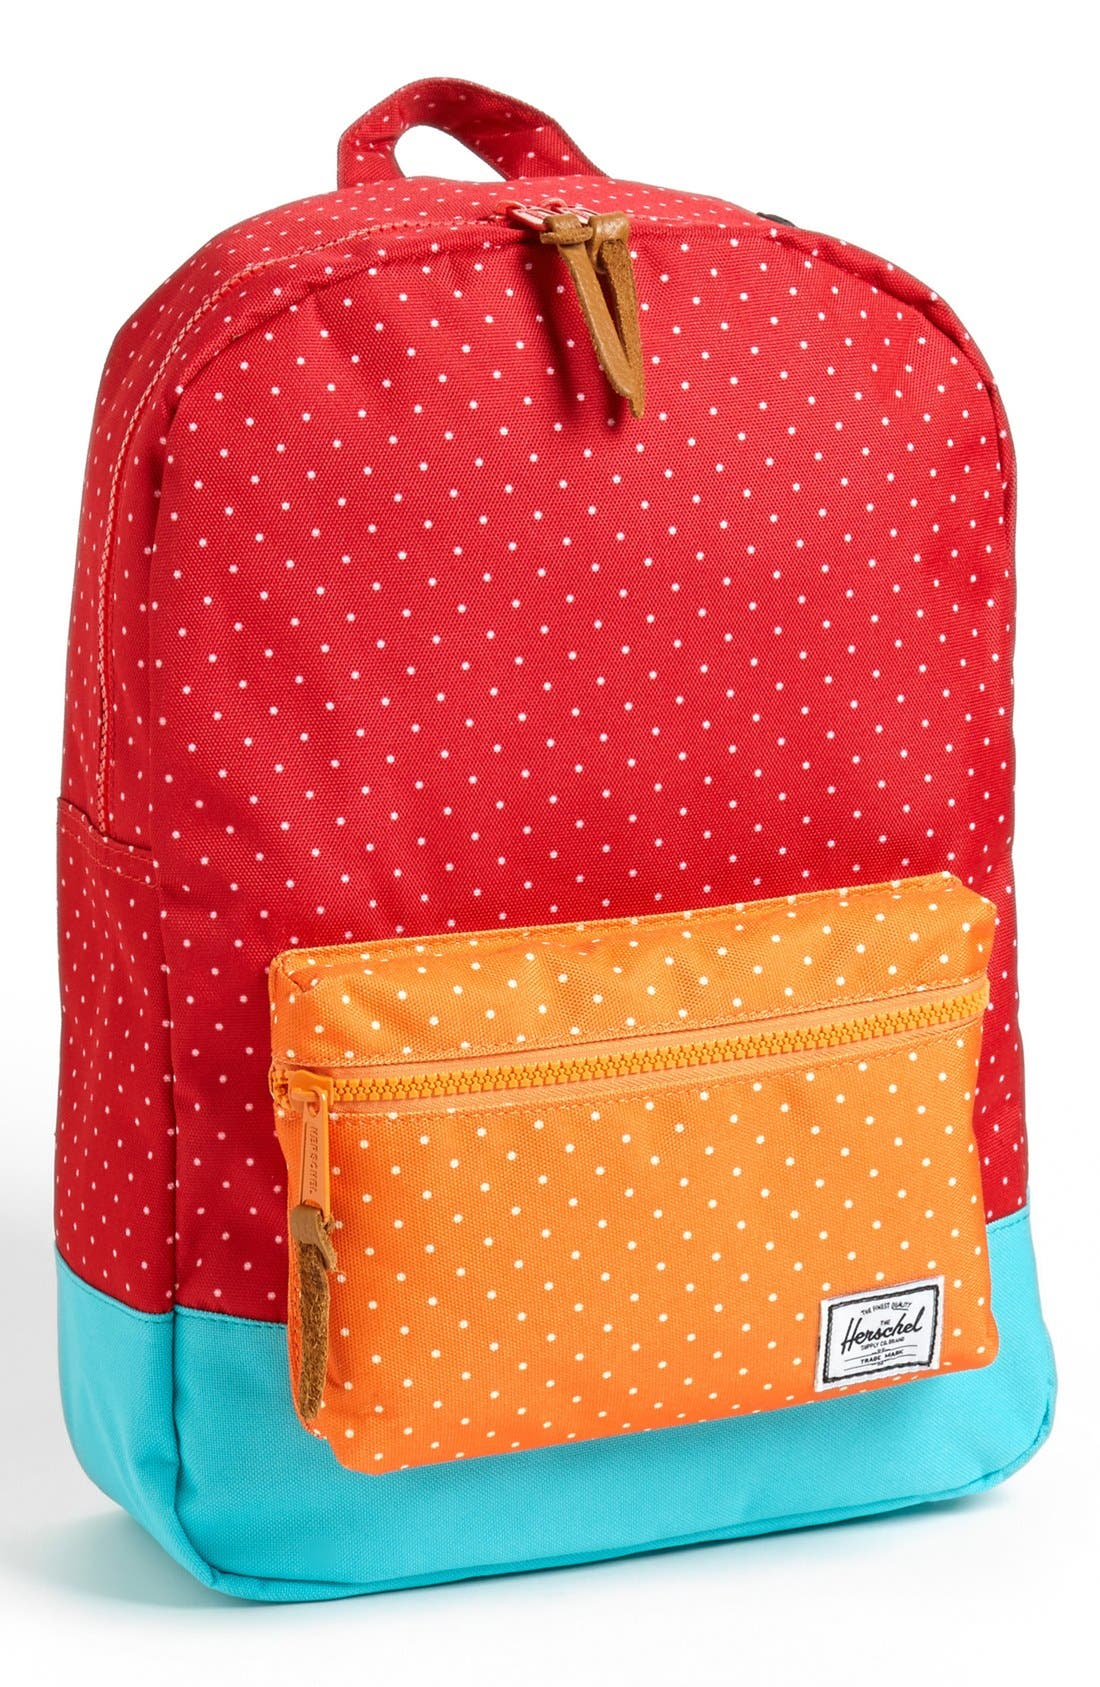 Main Image - Herschel Supply Co. 'Settlement' Backpack (Girls)